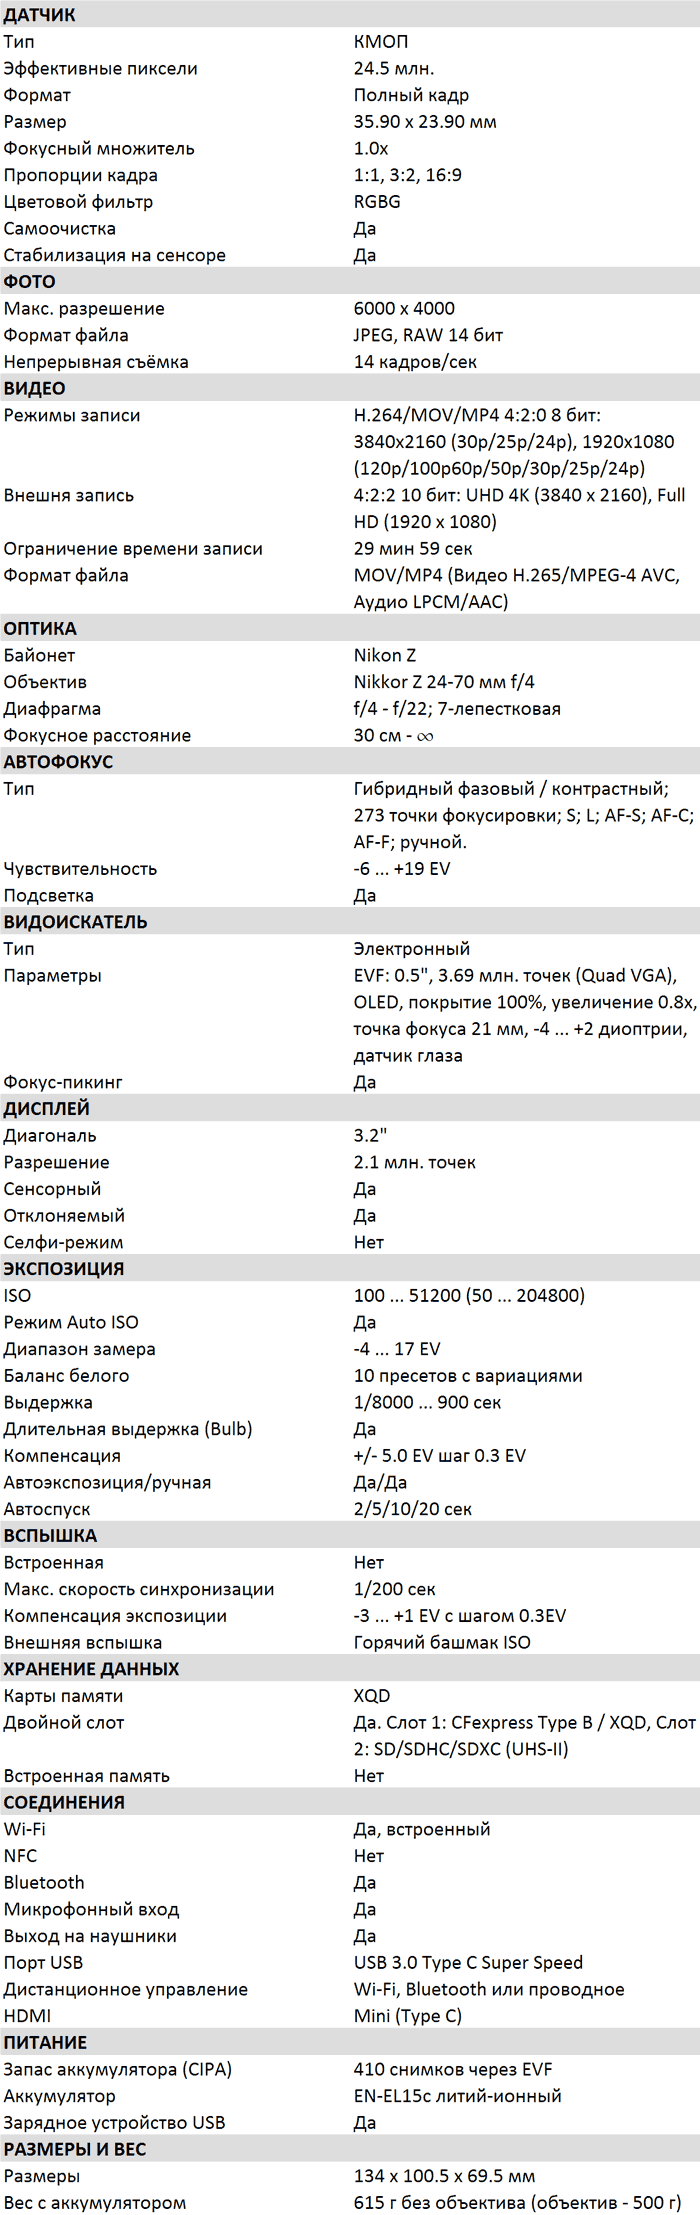 Характеристики Z6 II